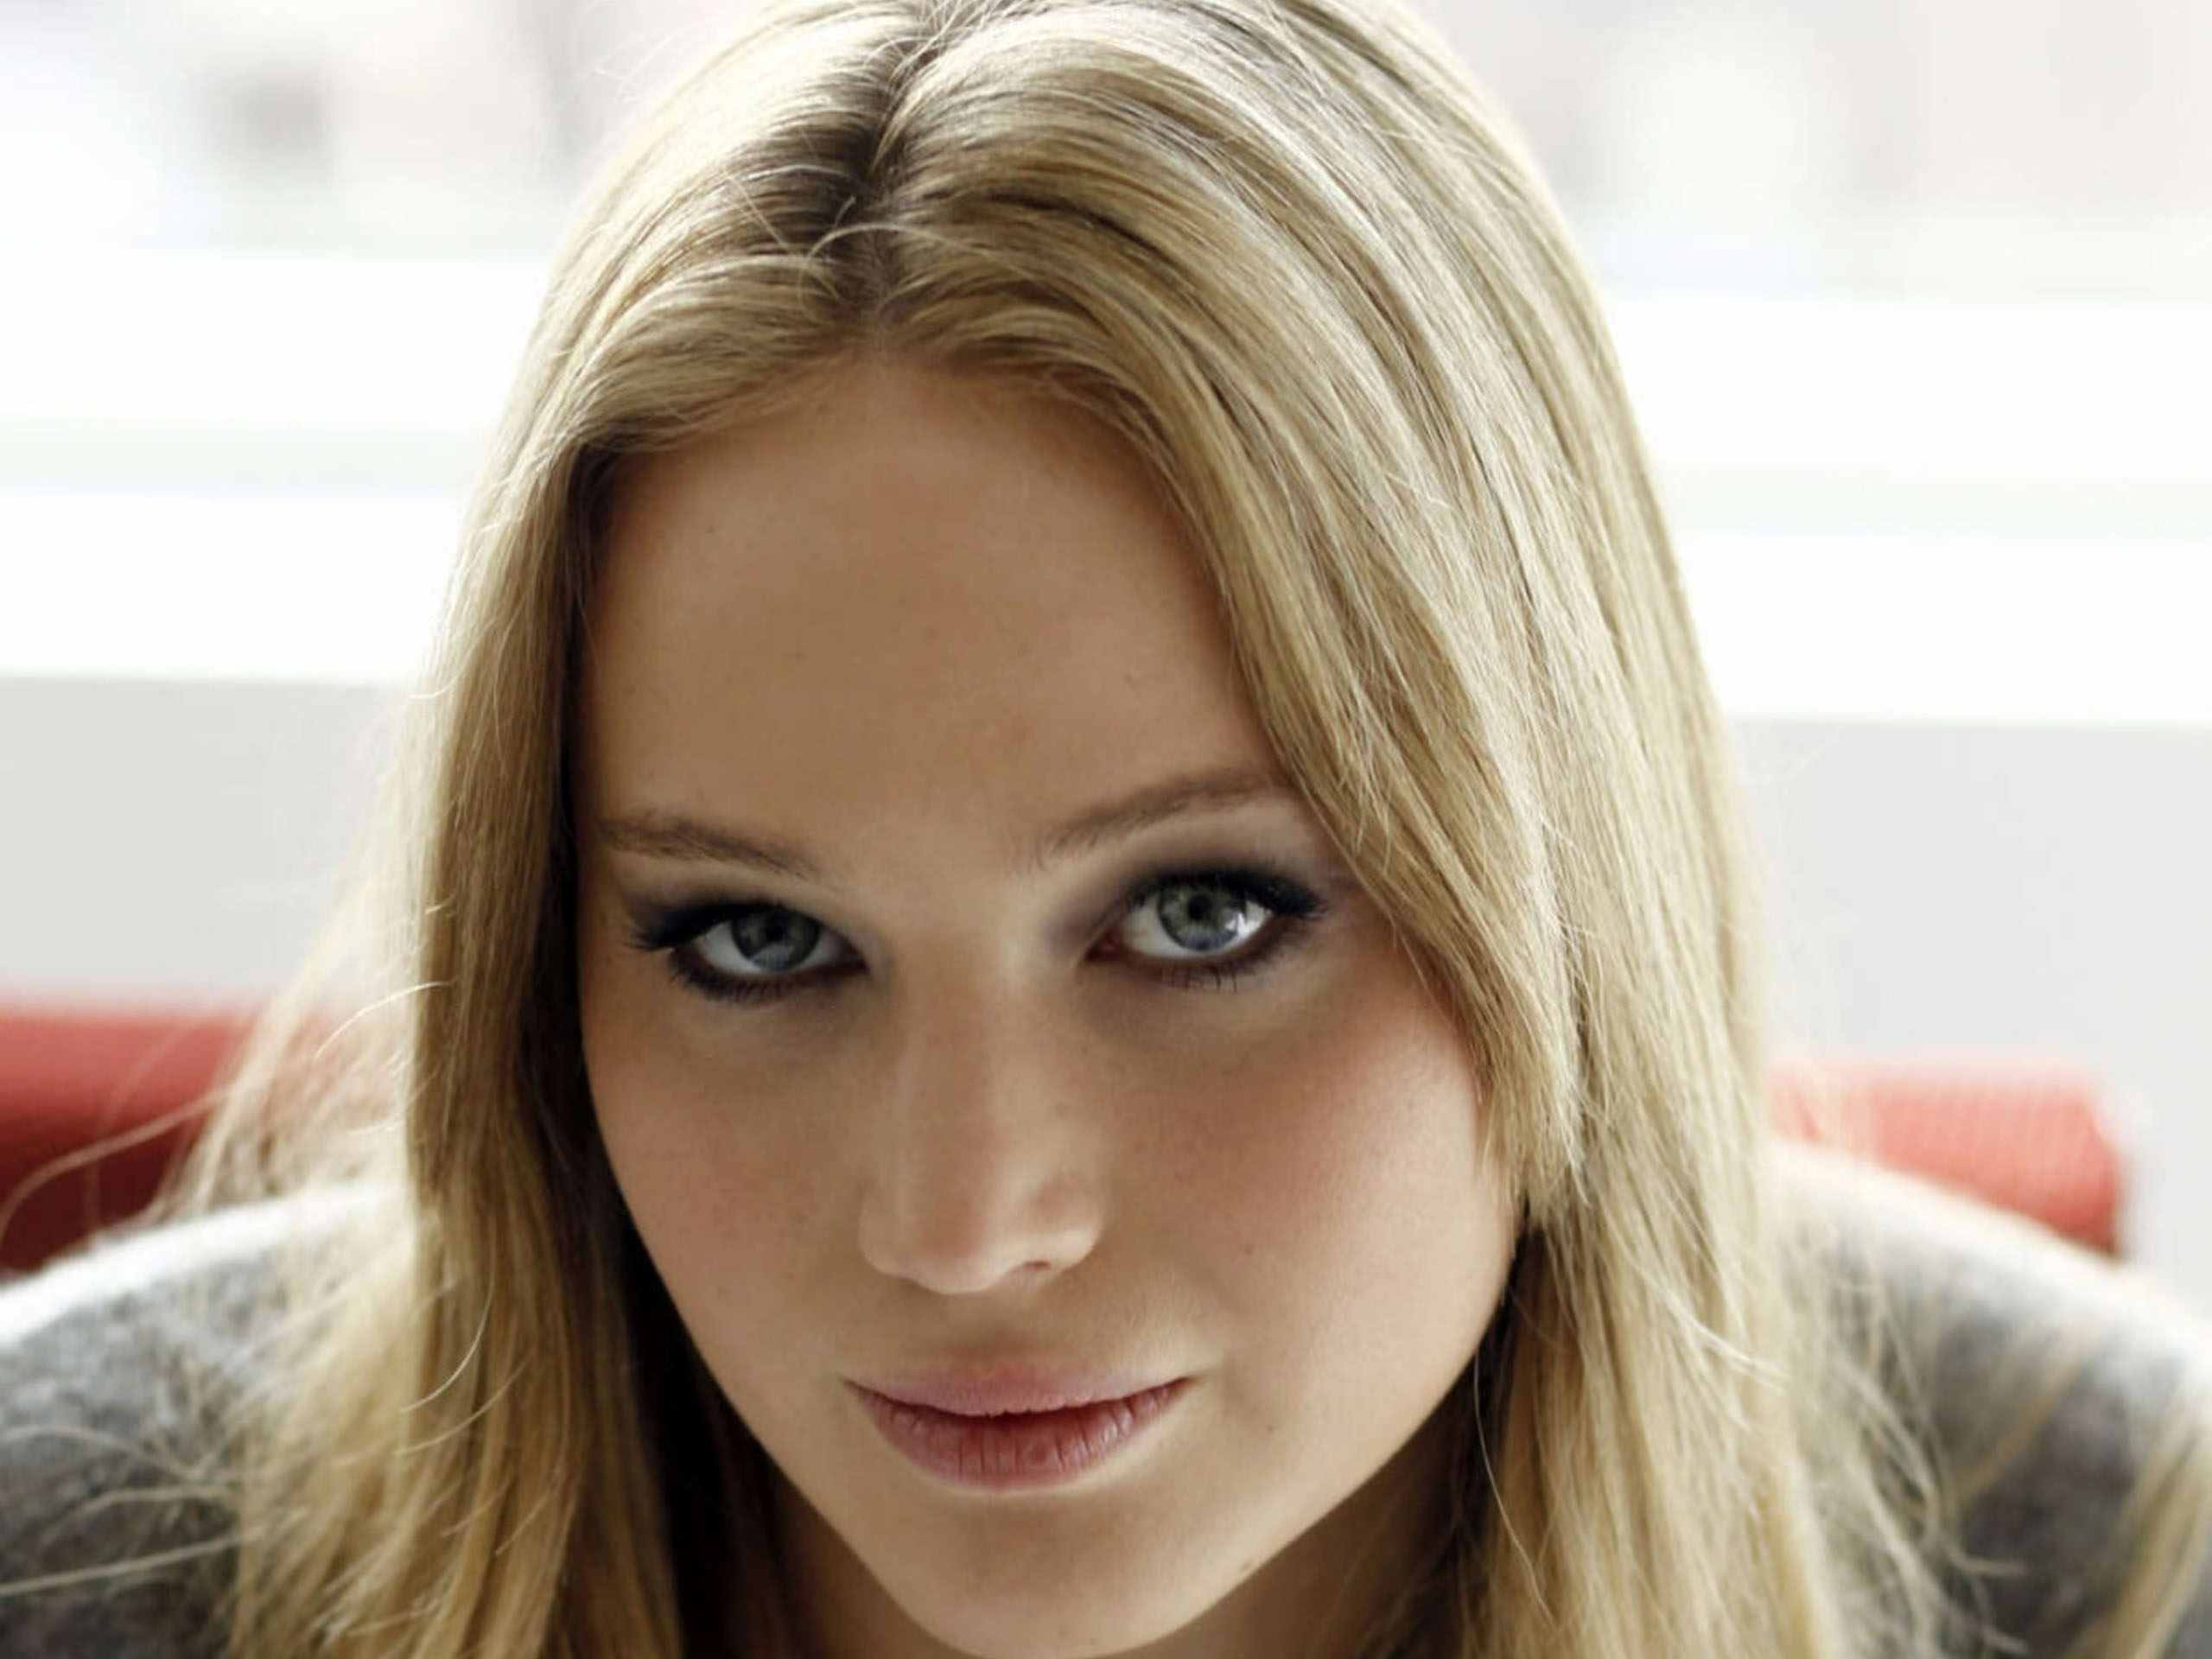 Jennifer-Lawrence-26-1-1